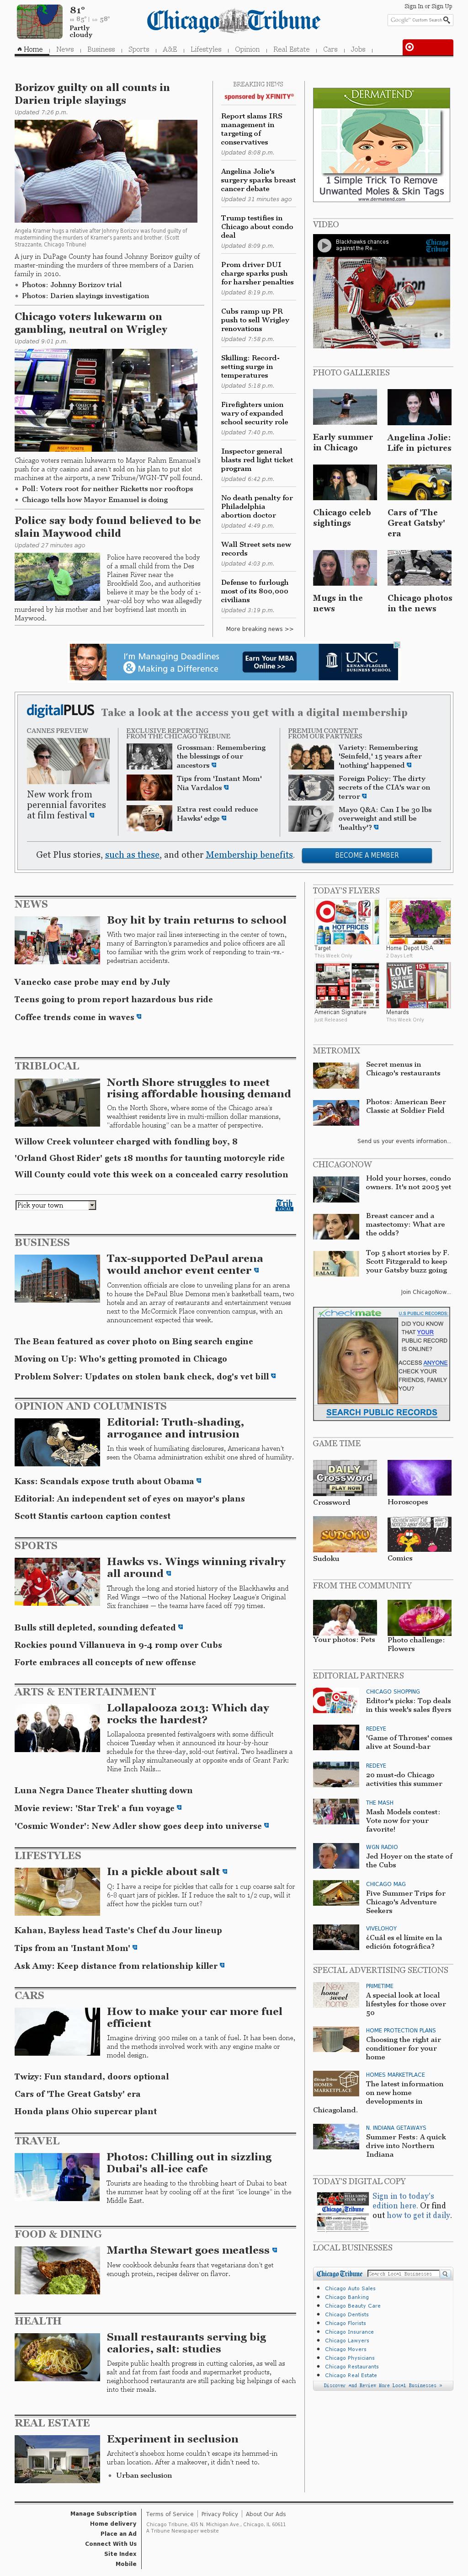 Chicago Tribune at Wednesday May 15, 2013, 3:03 a.m. UTC